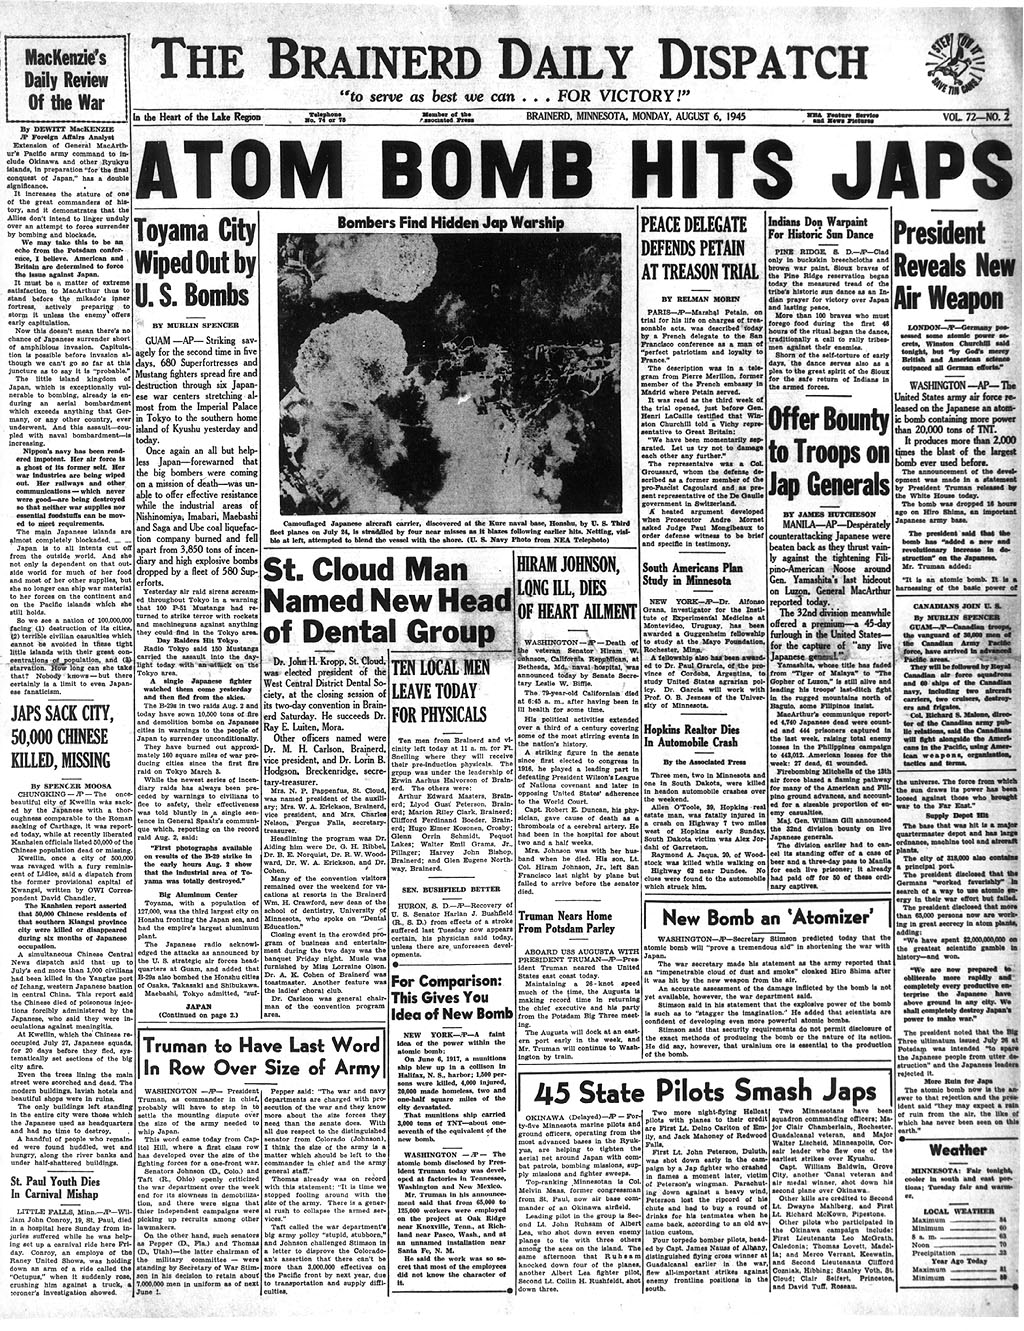 was the bombing of hiroshima and nagasaki necessary essay little boy bomb used against hiroshima